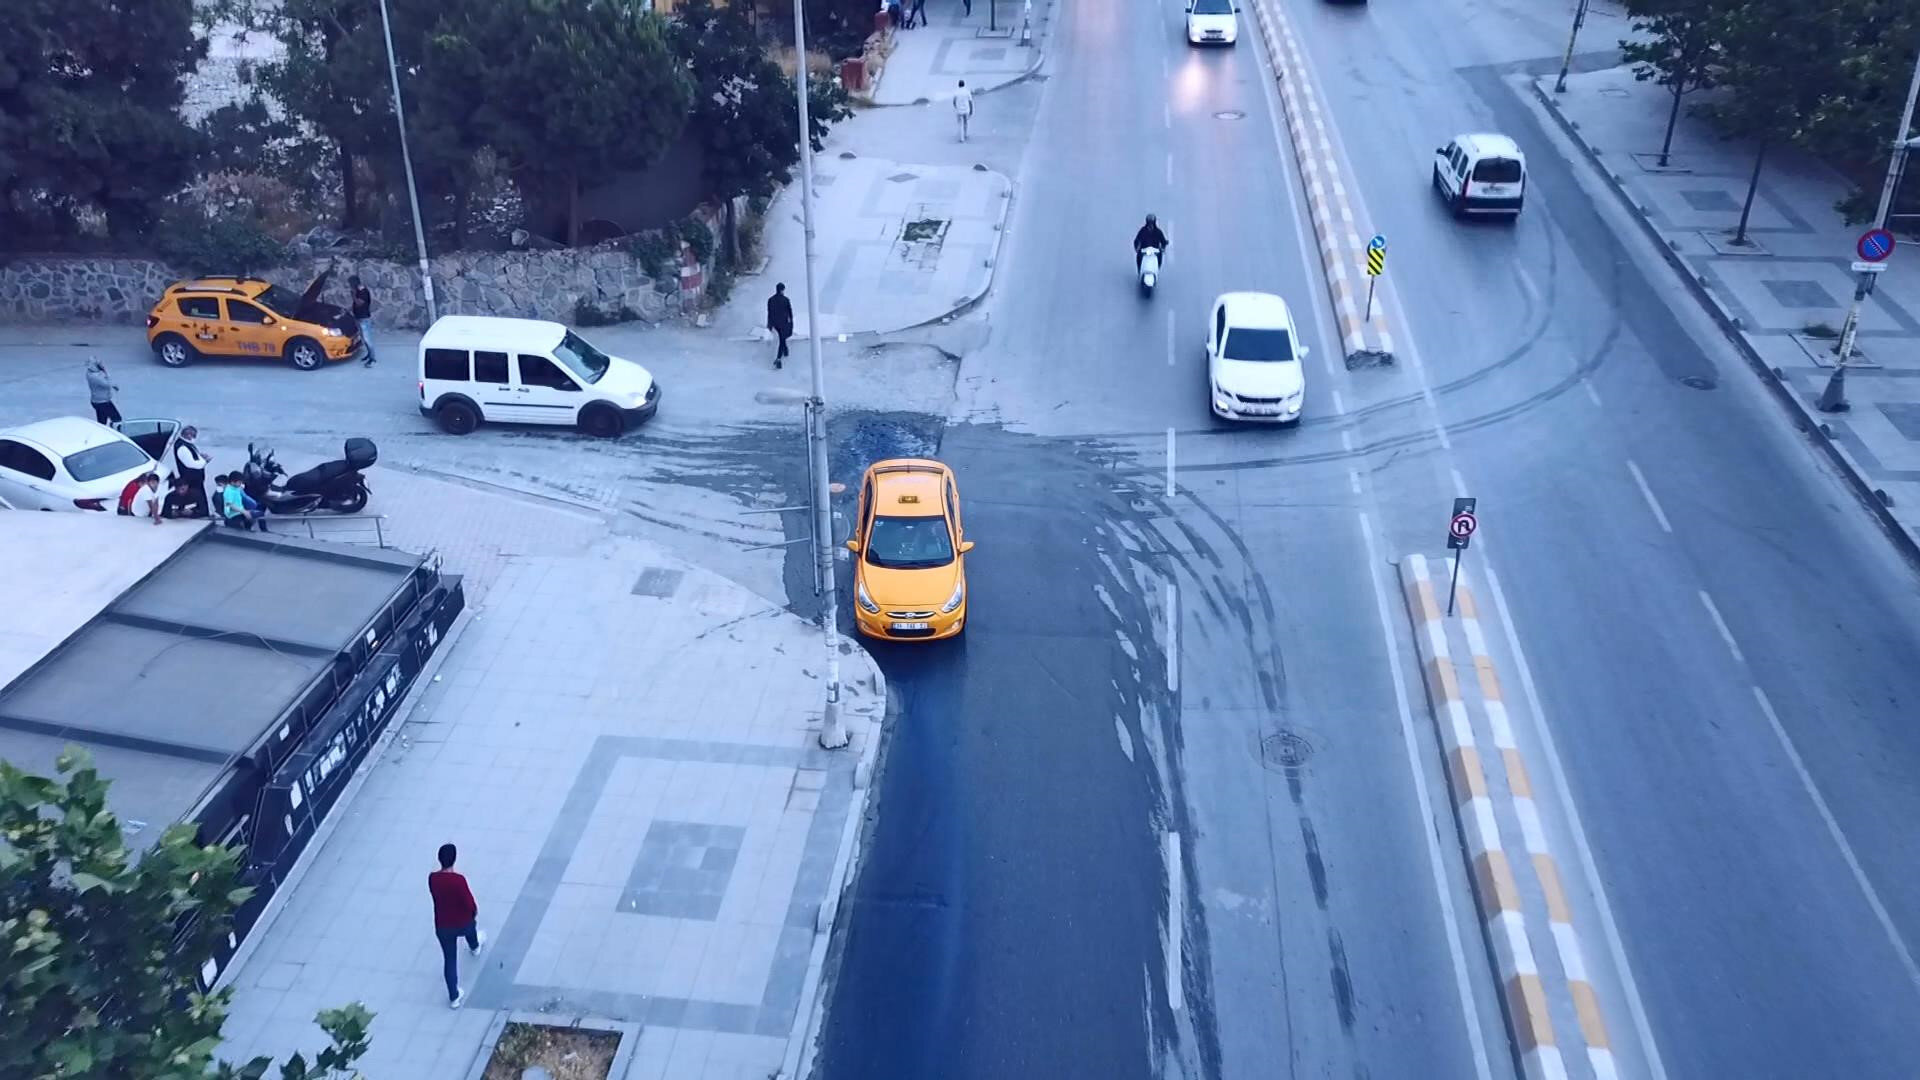 Dakikalarca akan su, caddeyi baştan aşağı maviye boyadı.